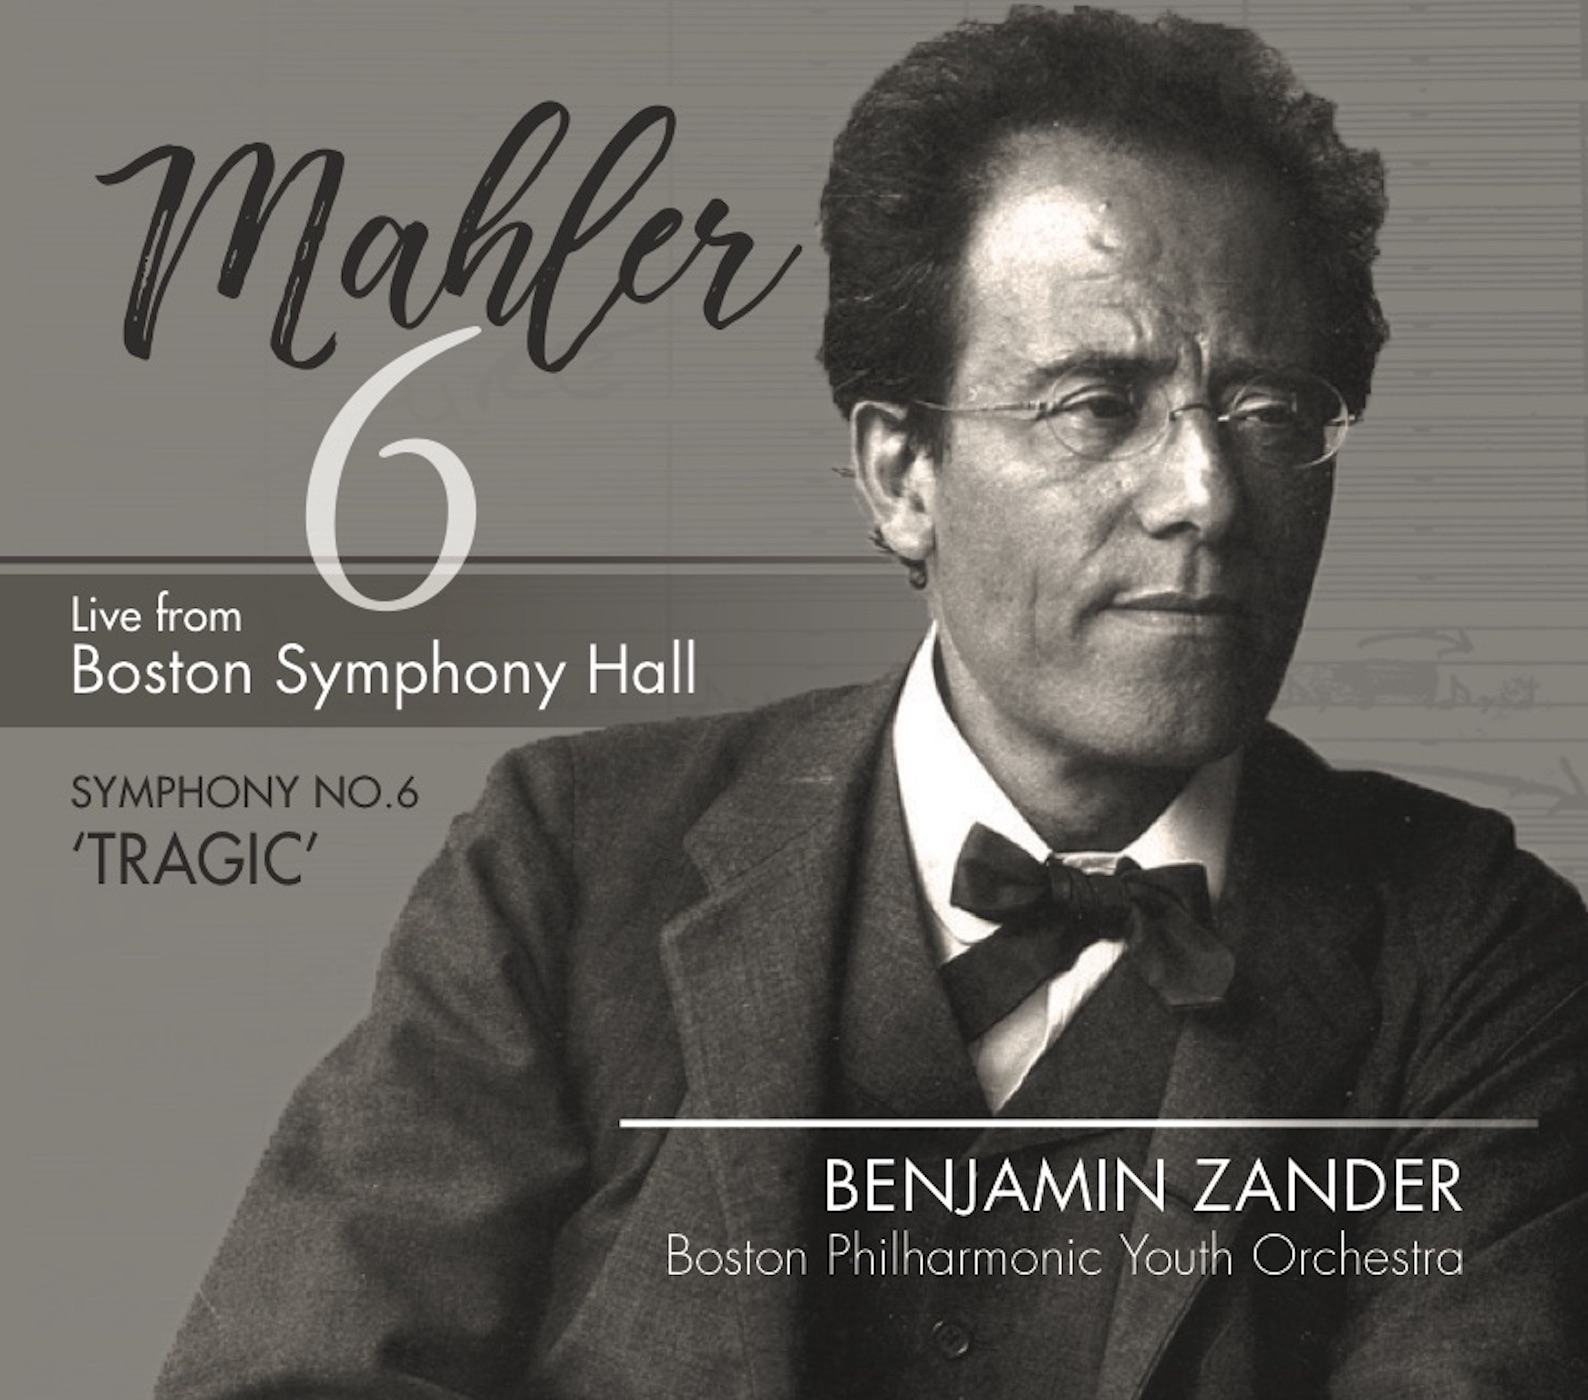 Mahler6Cover-FINAL-PRINT-CoverOnly (1).jpg